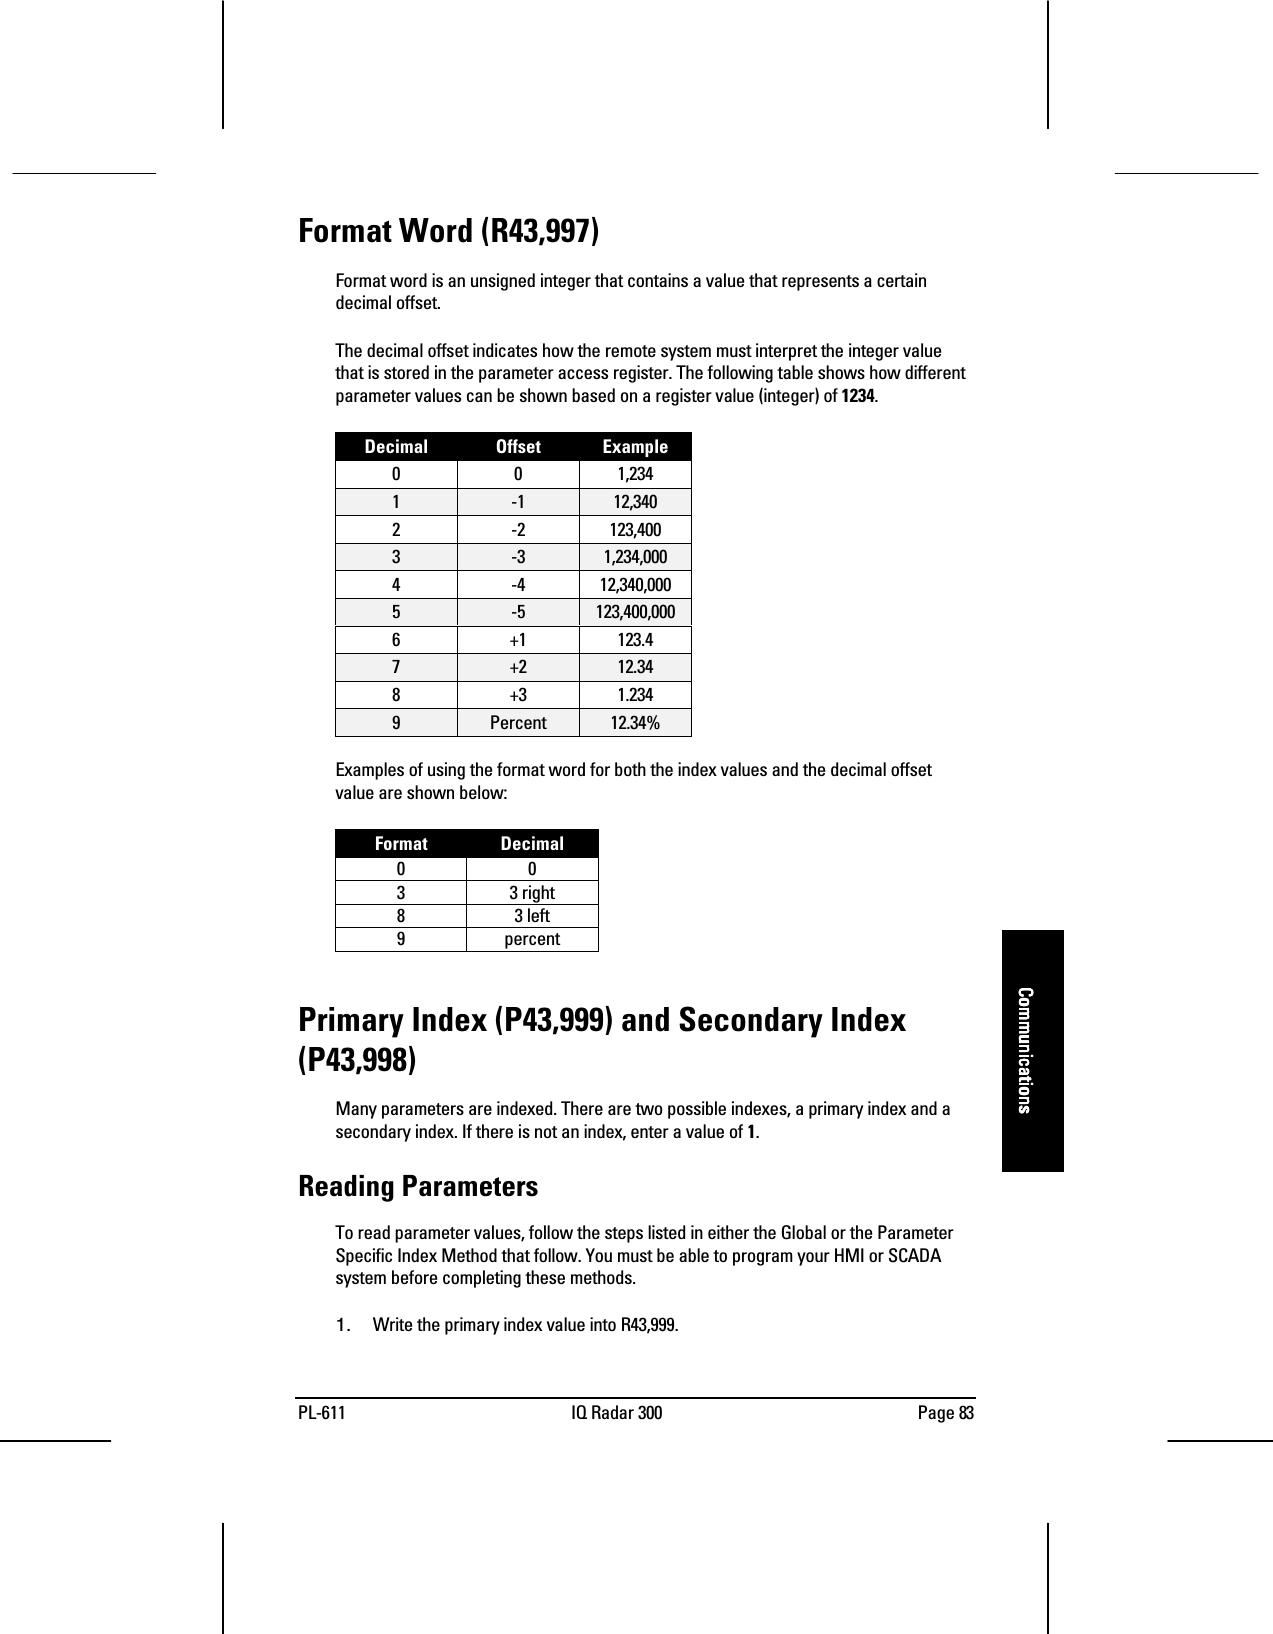 siemens iq 300 user manual